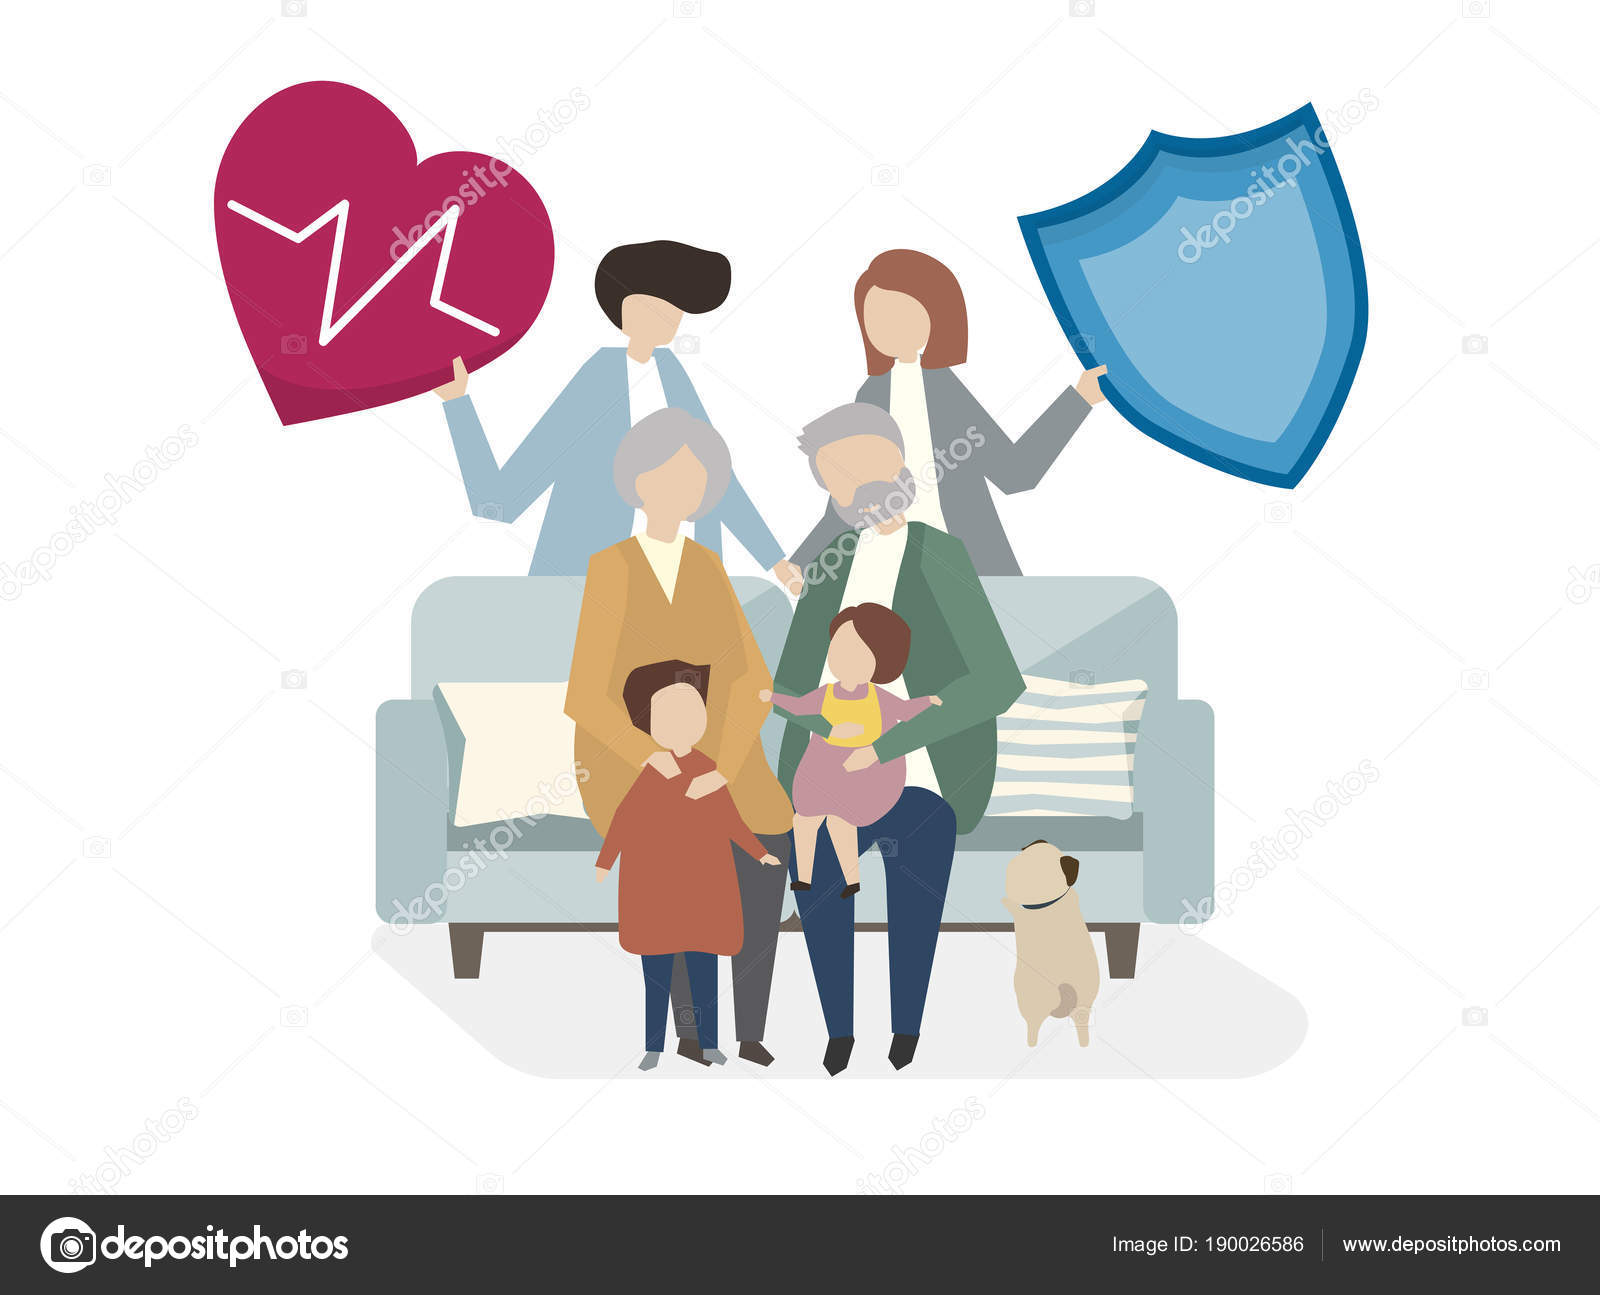 Illustration Family Life Insurance Stock Photo C Rawpixel 190026586